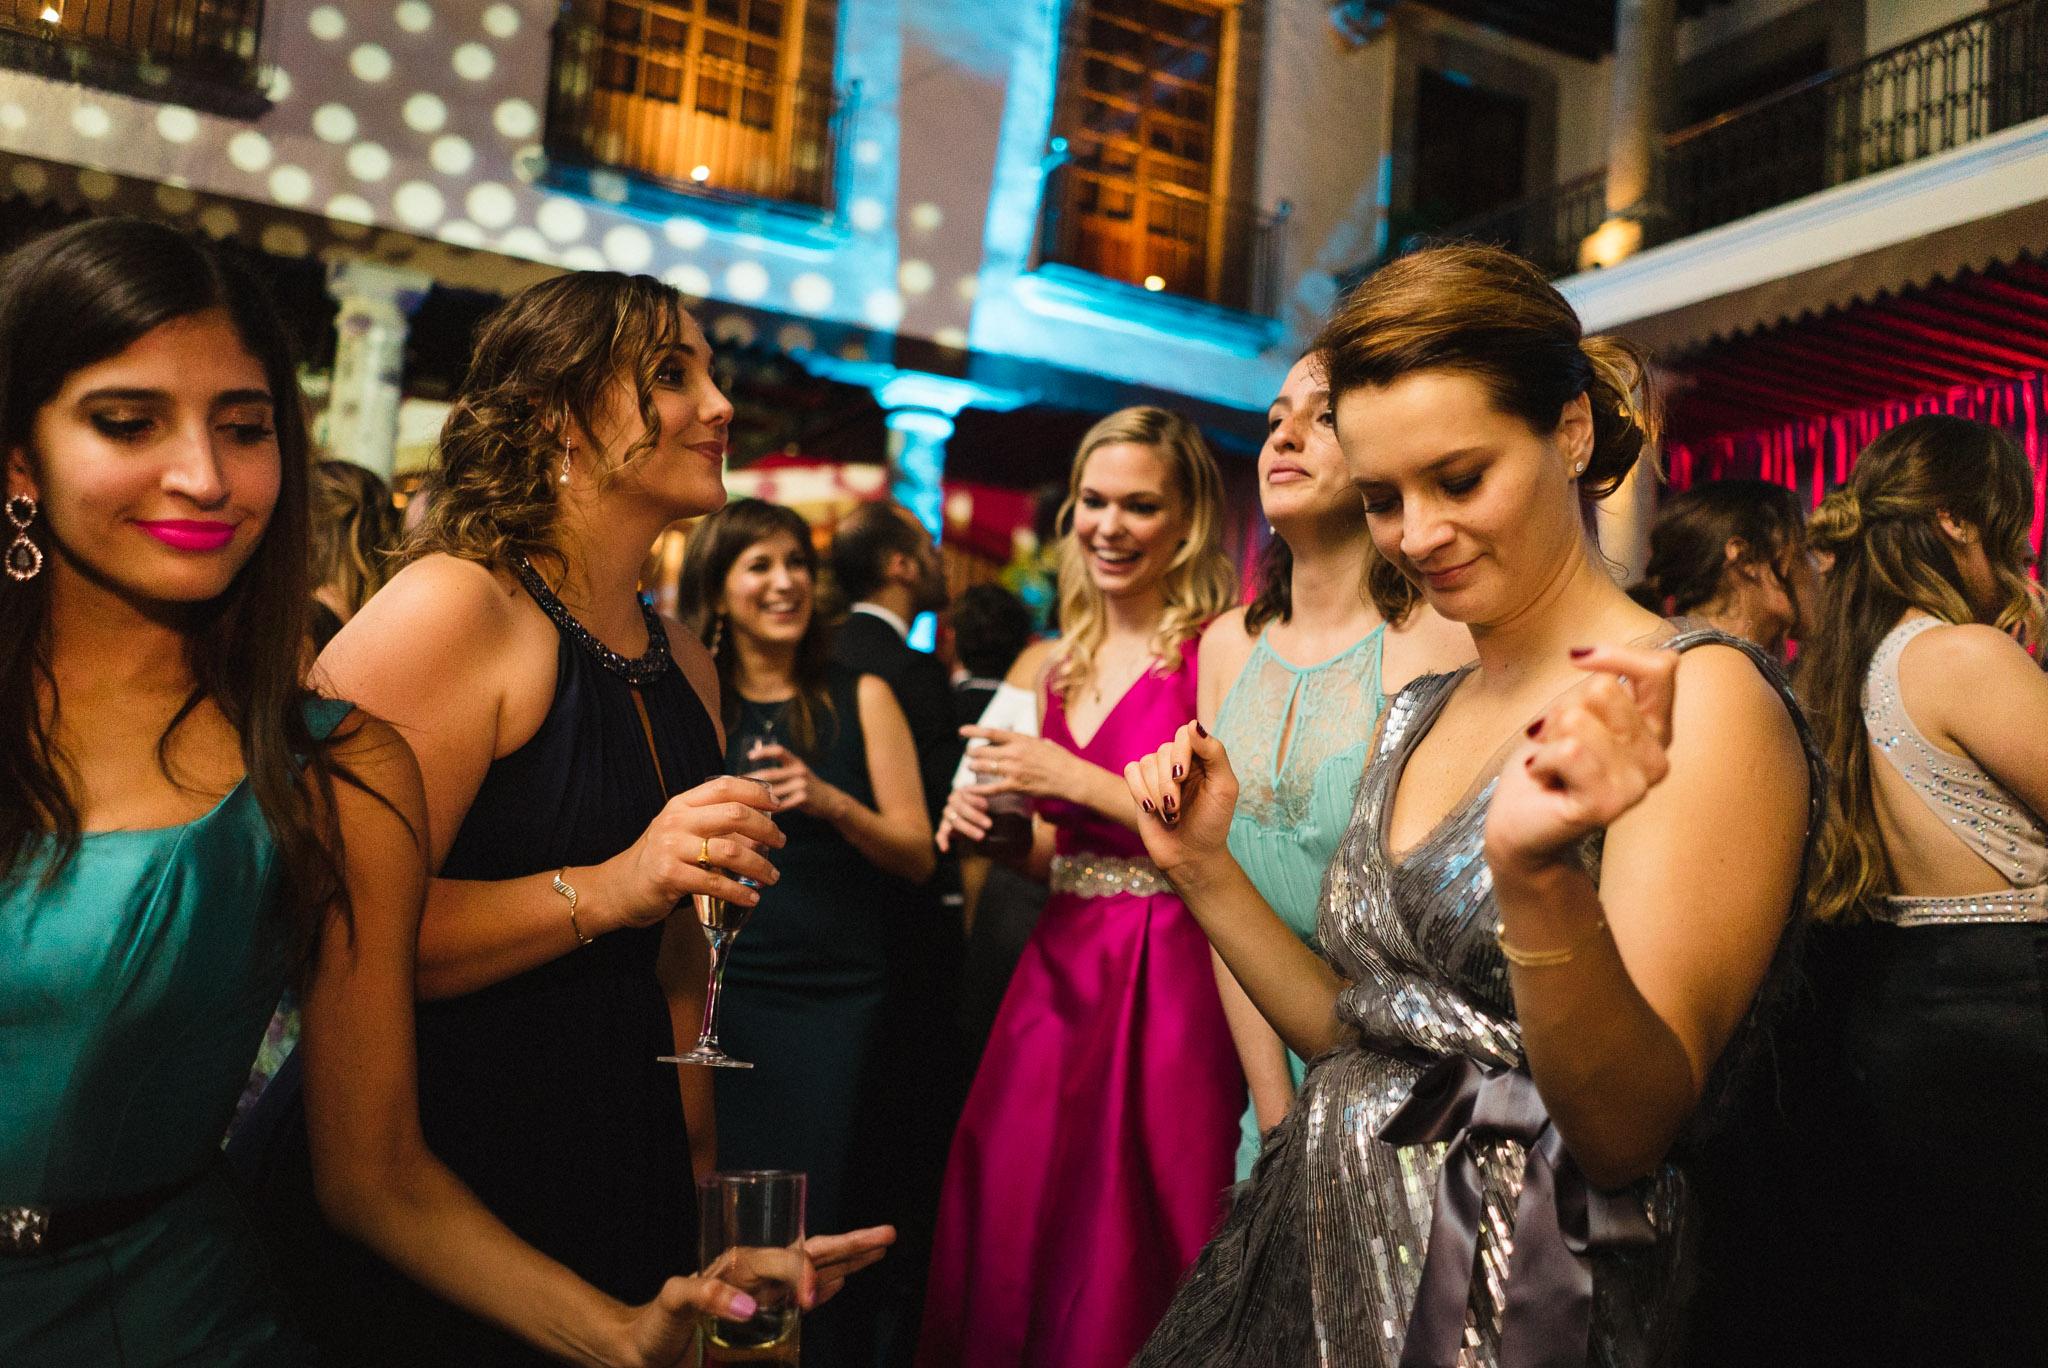 ©www.mauriziosolisbroca.com-20161002maurizio-solis-broca-mexico-canada-wedding-photographer20161002DSC09376-Edit.jpg